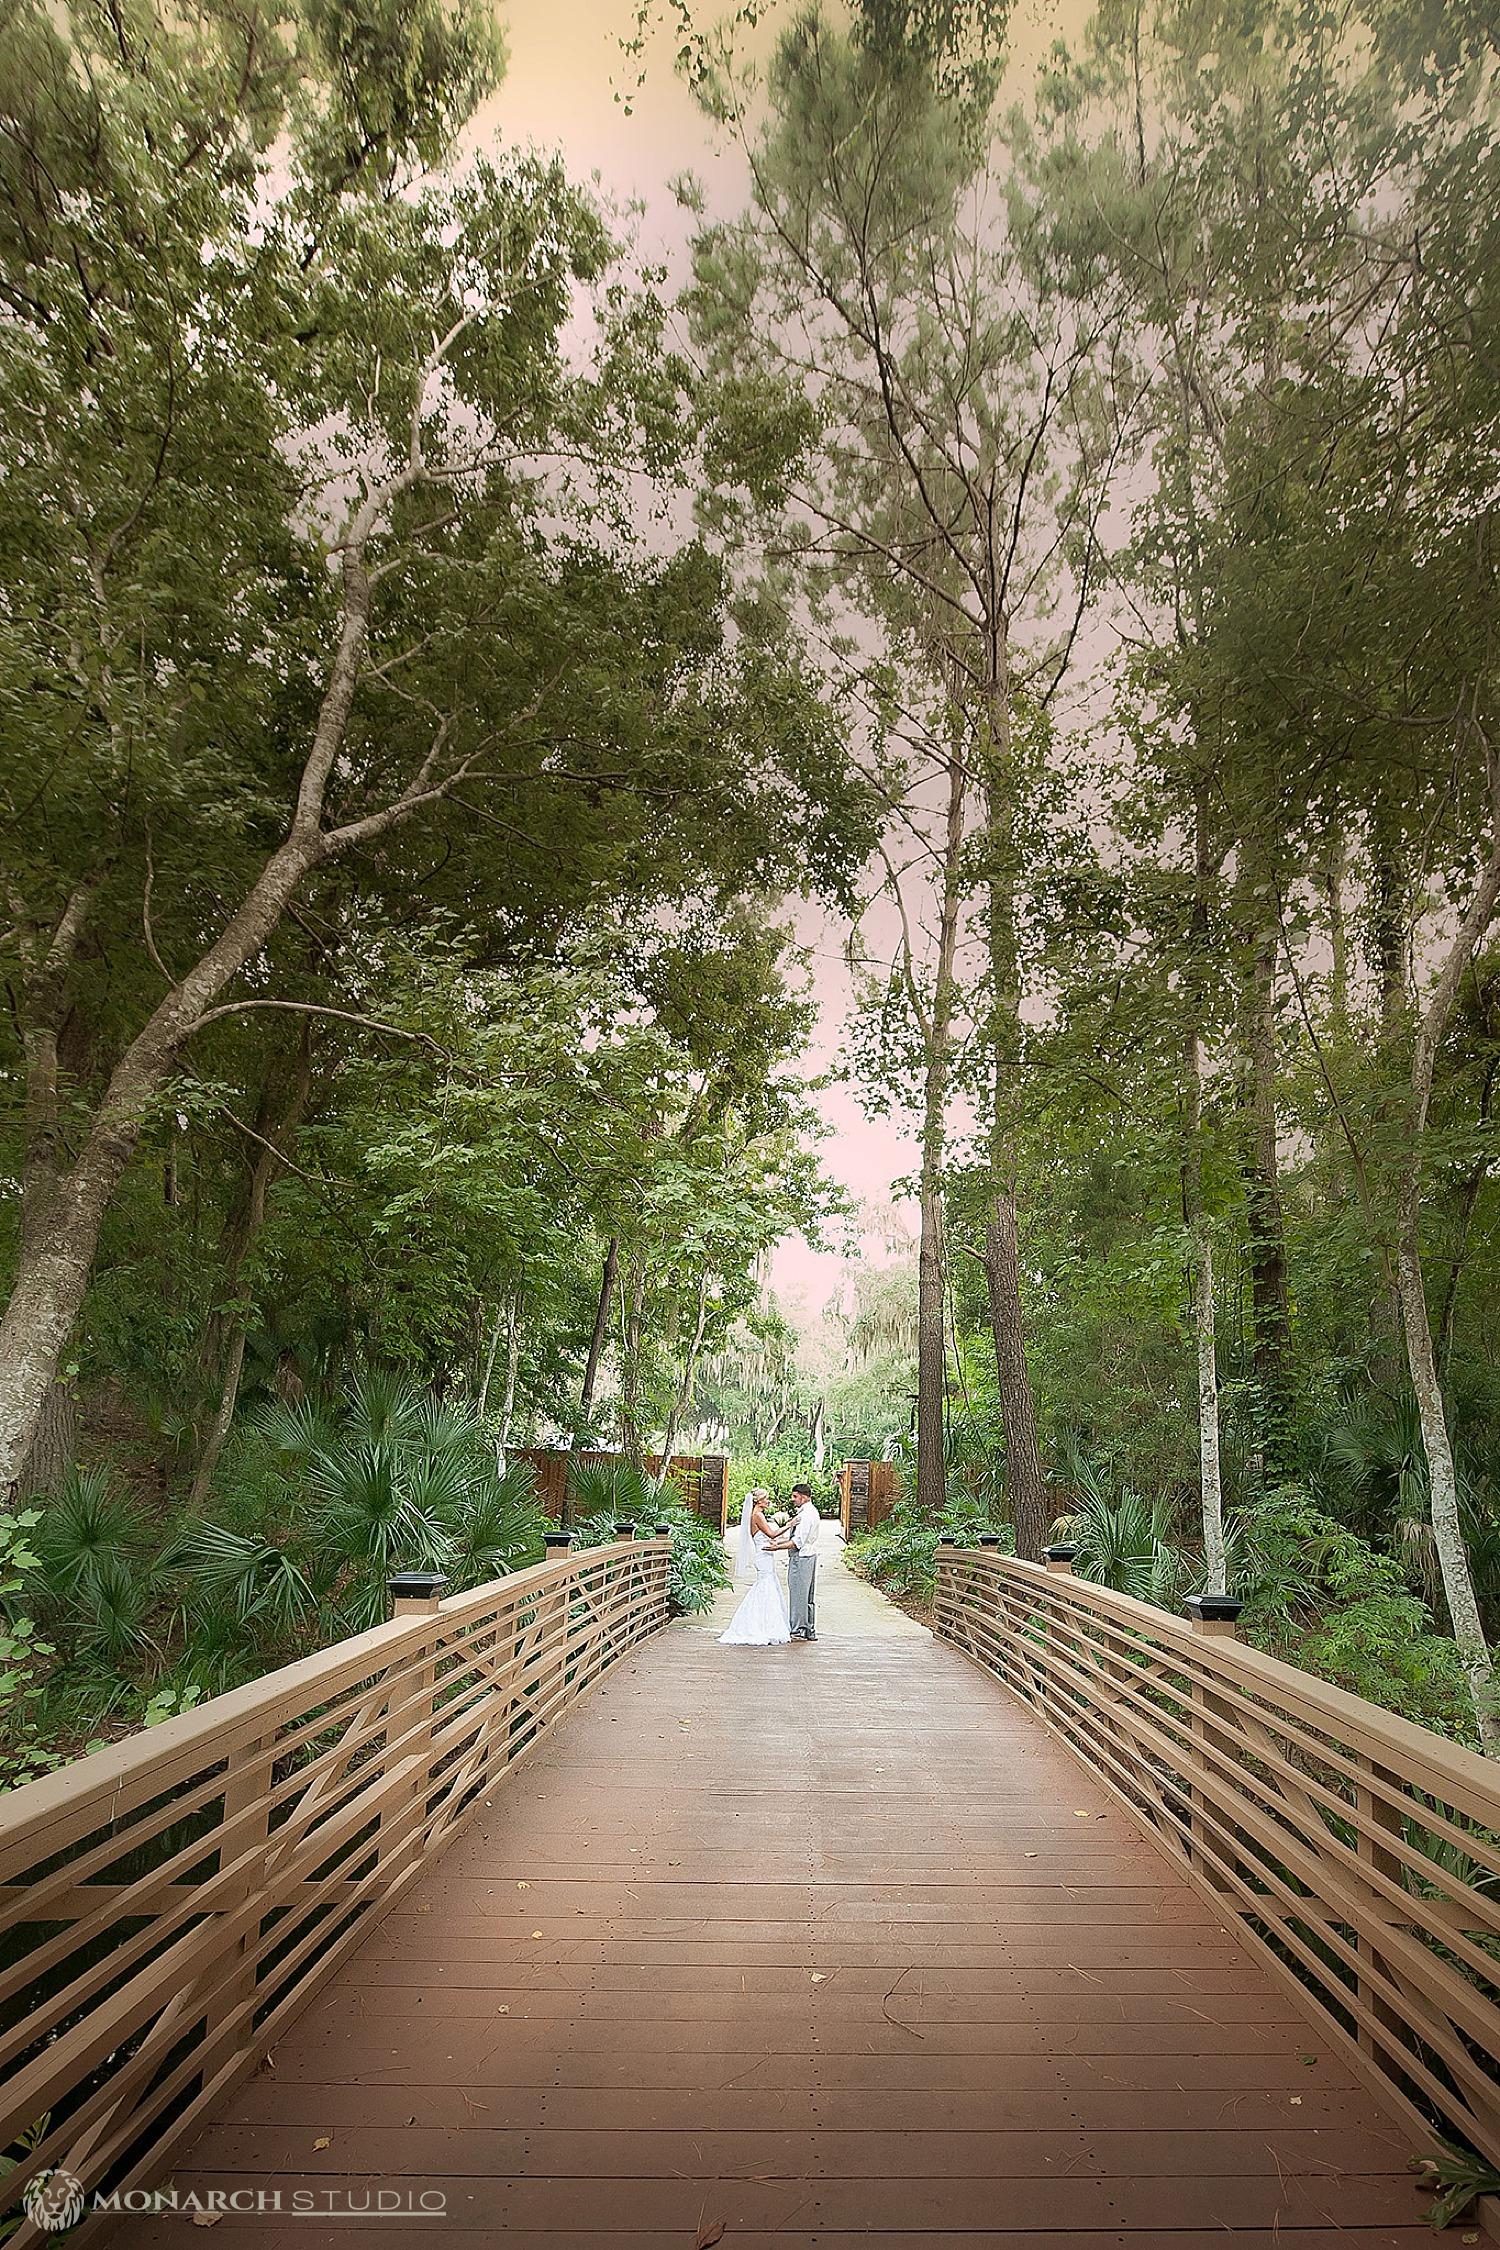 ponte-vedra-wedding-photographer-sawgrass-wedding_0014.jpg